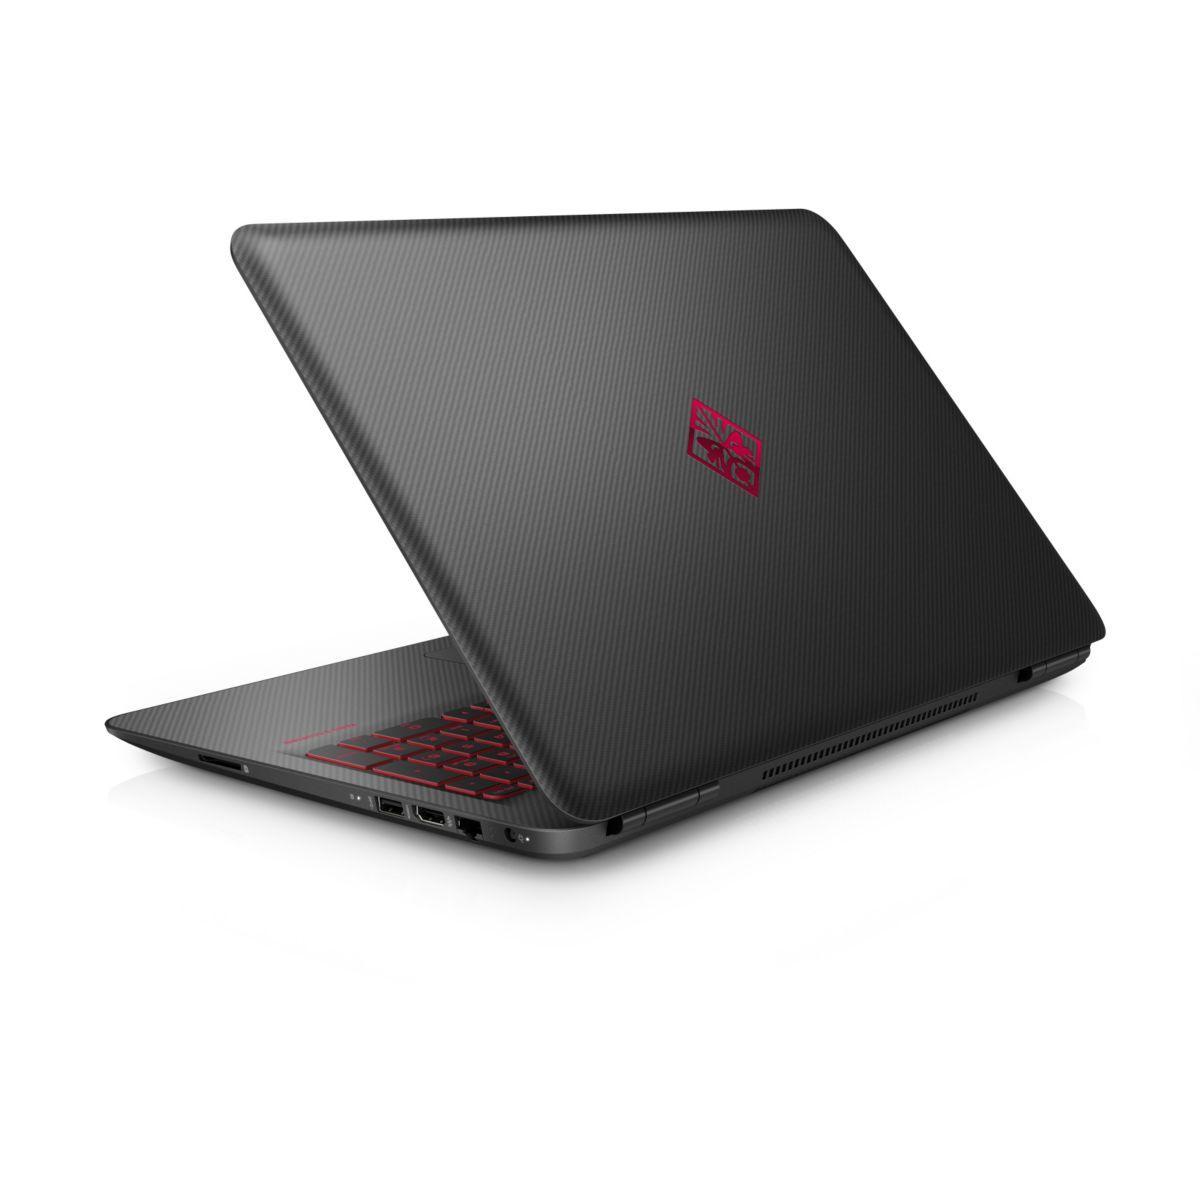 HP OMEN 15-ax004nf 15,6 - Core i7-6700HQ - 12GB 2128GB NVIDIA GeForce GTX 960M AZERTY - Francúzska